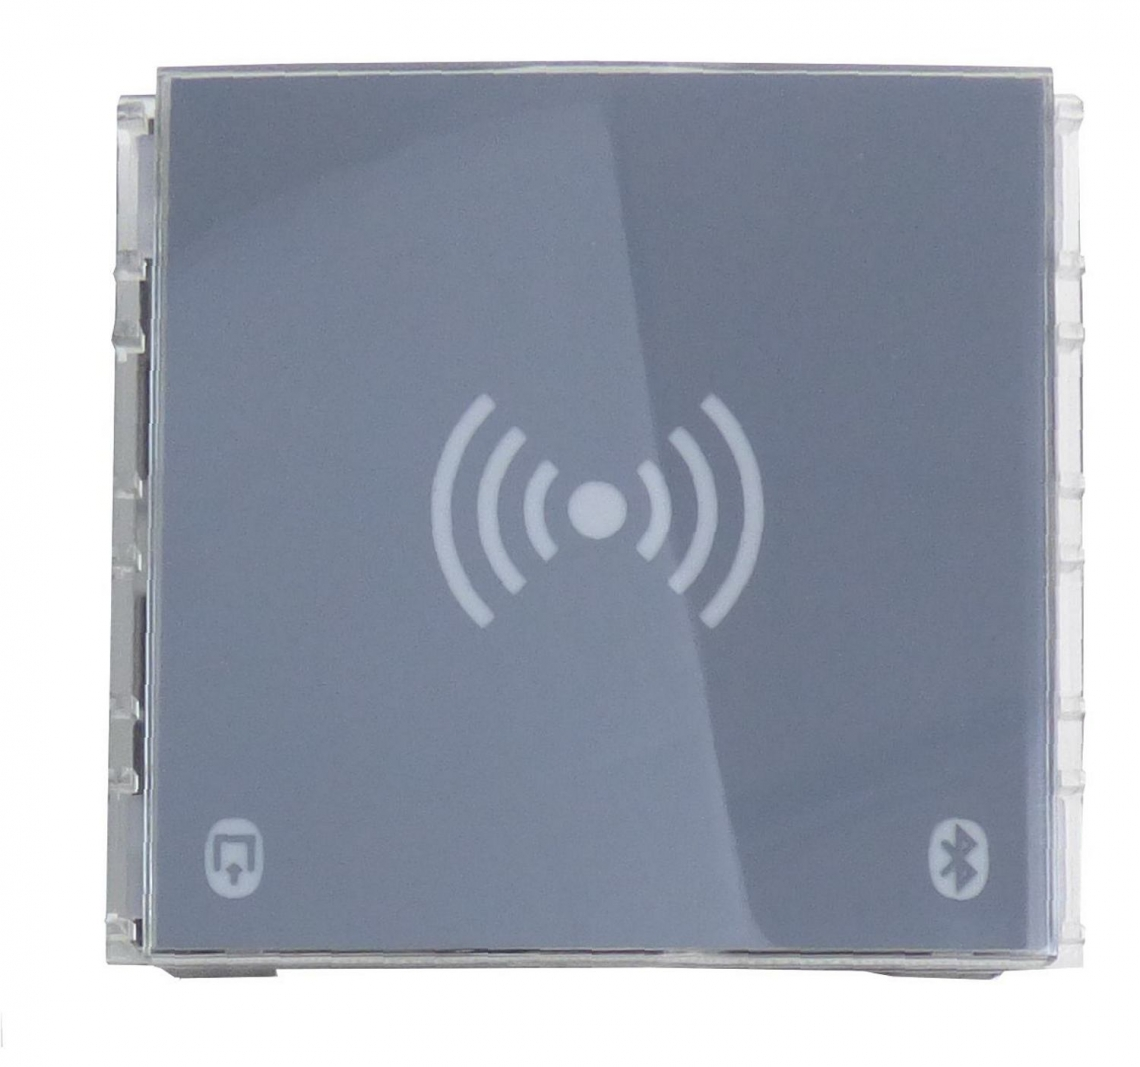 Proximity reader module Alba - FP51AB